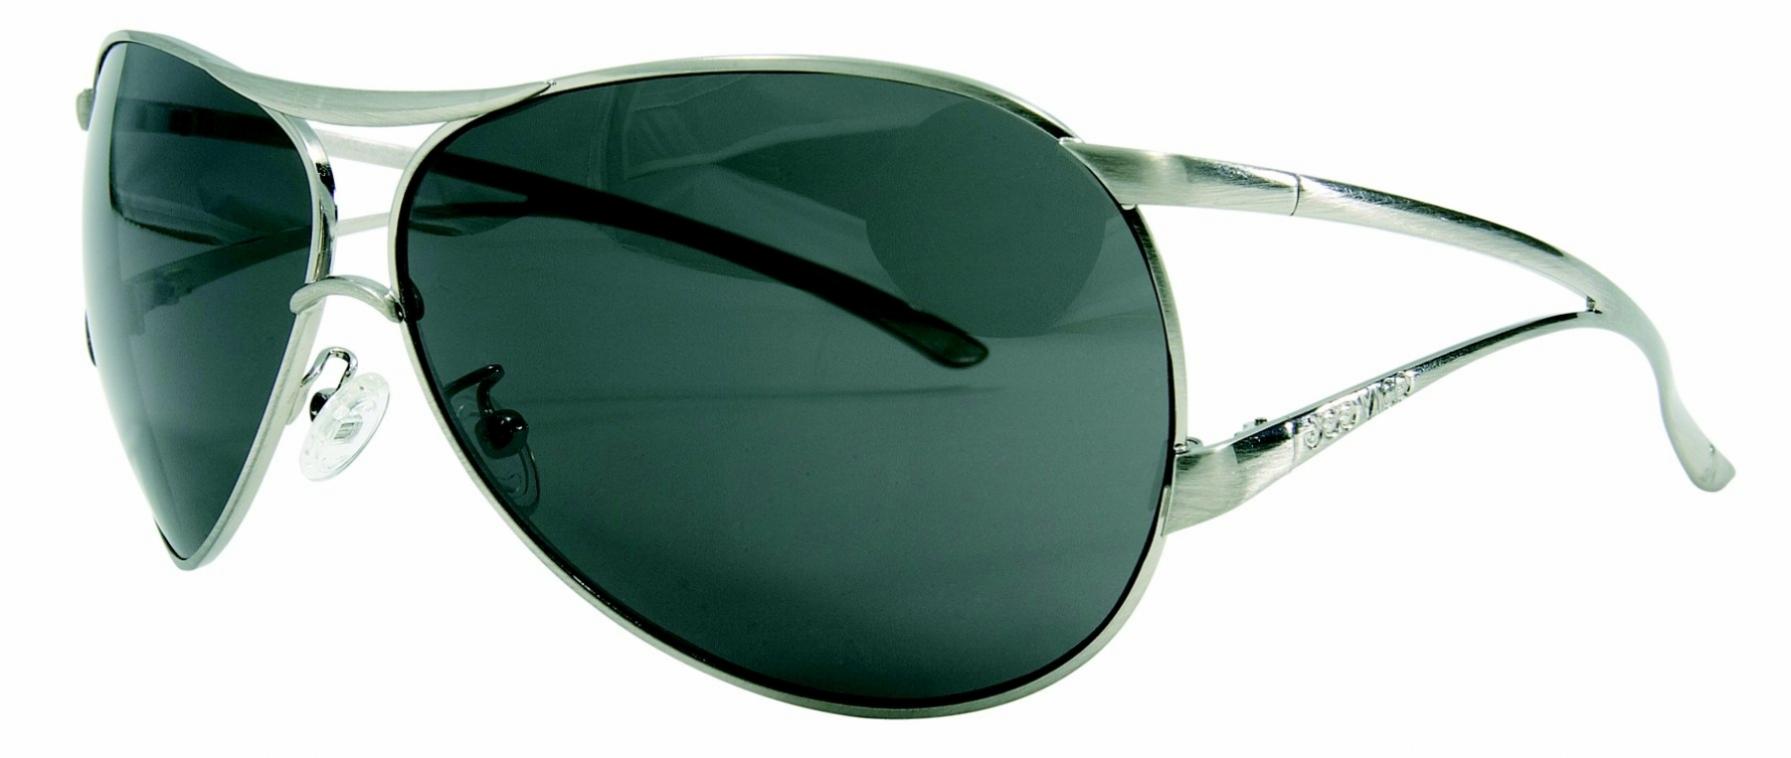 Jee vice sunglasses discount designer sunglasses for Decor my eyes